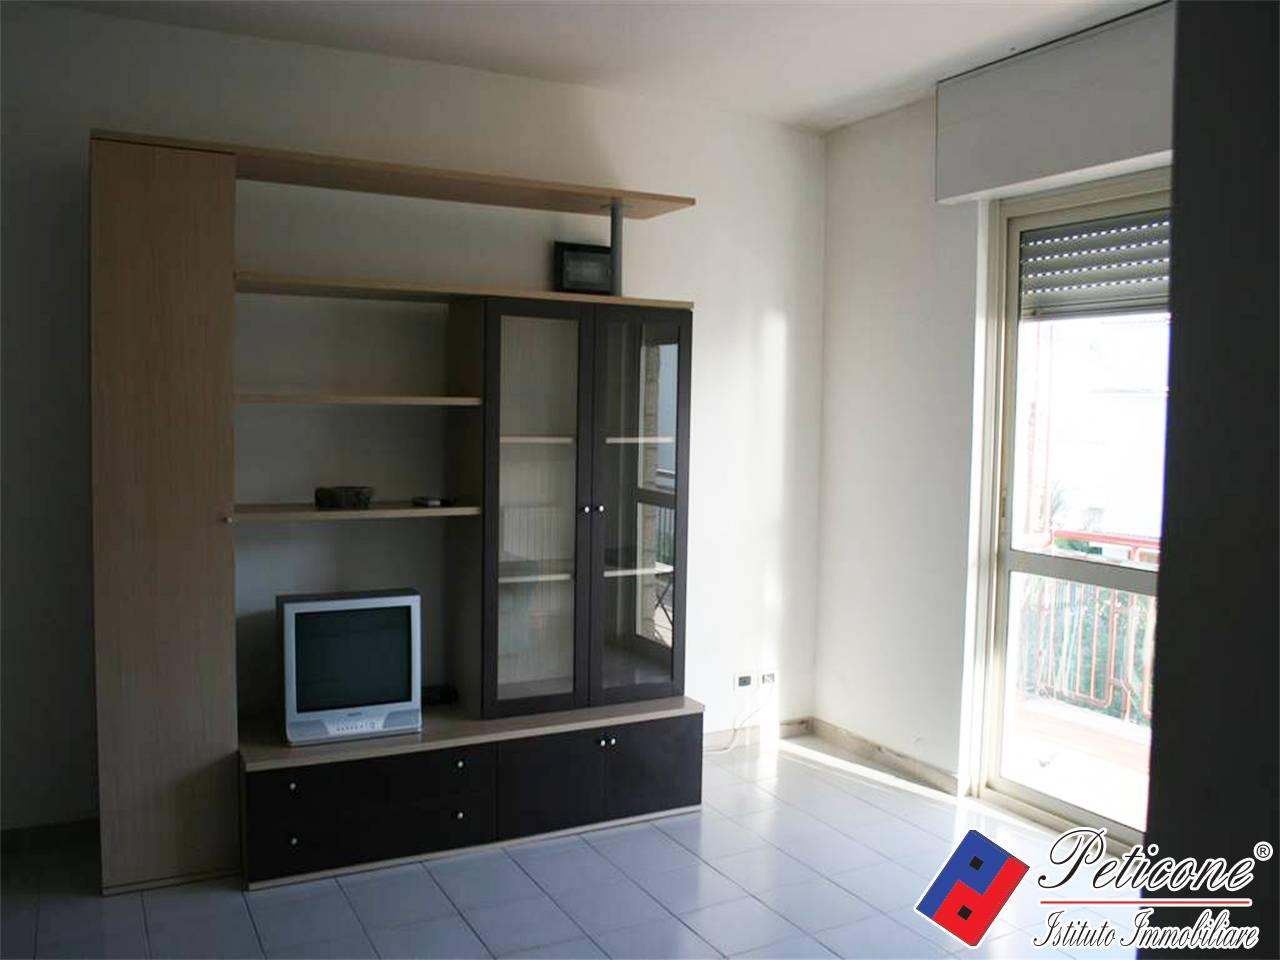 Appartamento in Vendita a Gaeta: 4 locali, 91 mq - Foto 3